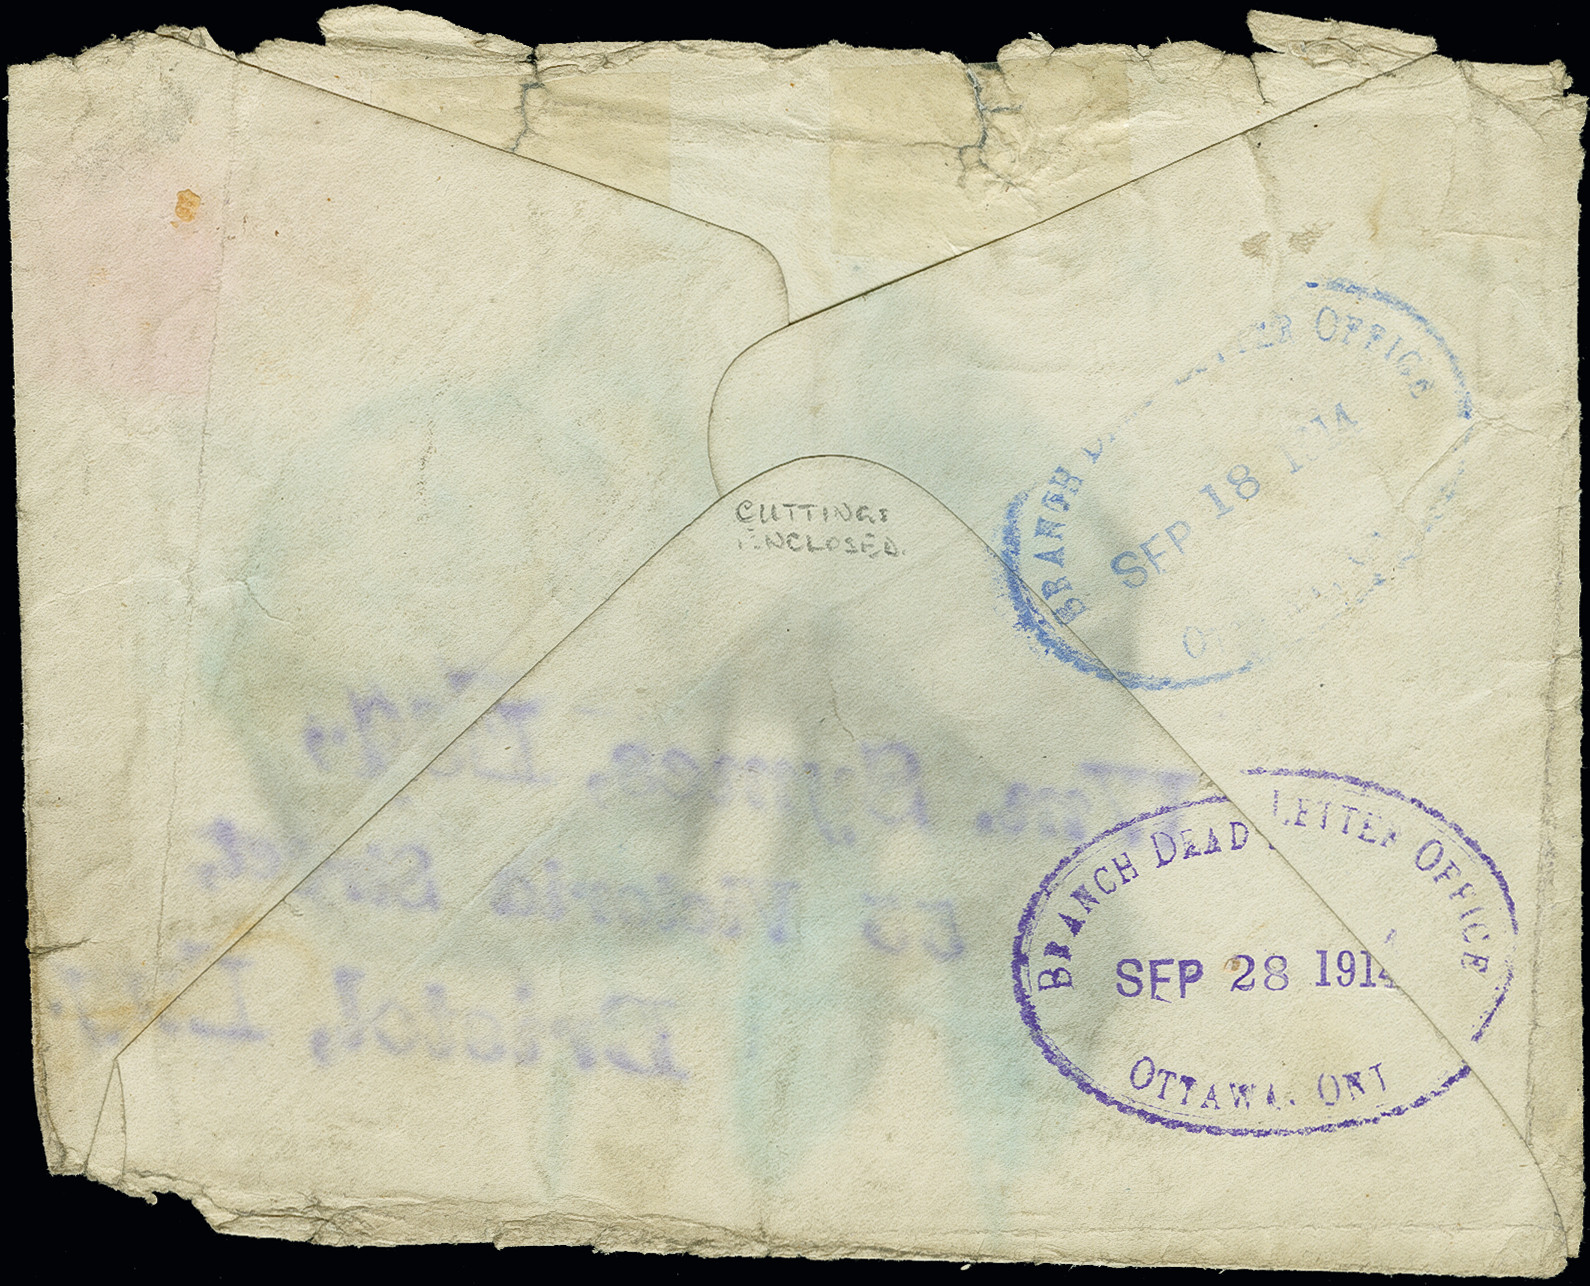 Lot 1146 - Main catalogue foreign ship mail -  Heinrich Koehler Auktionen Auction #368- Day 2